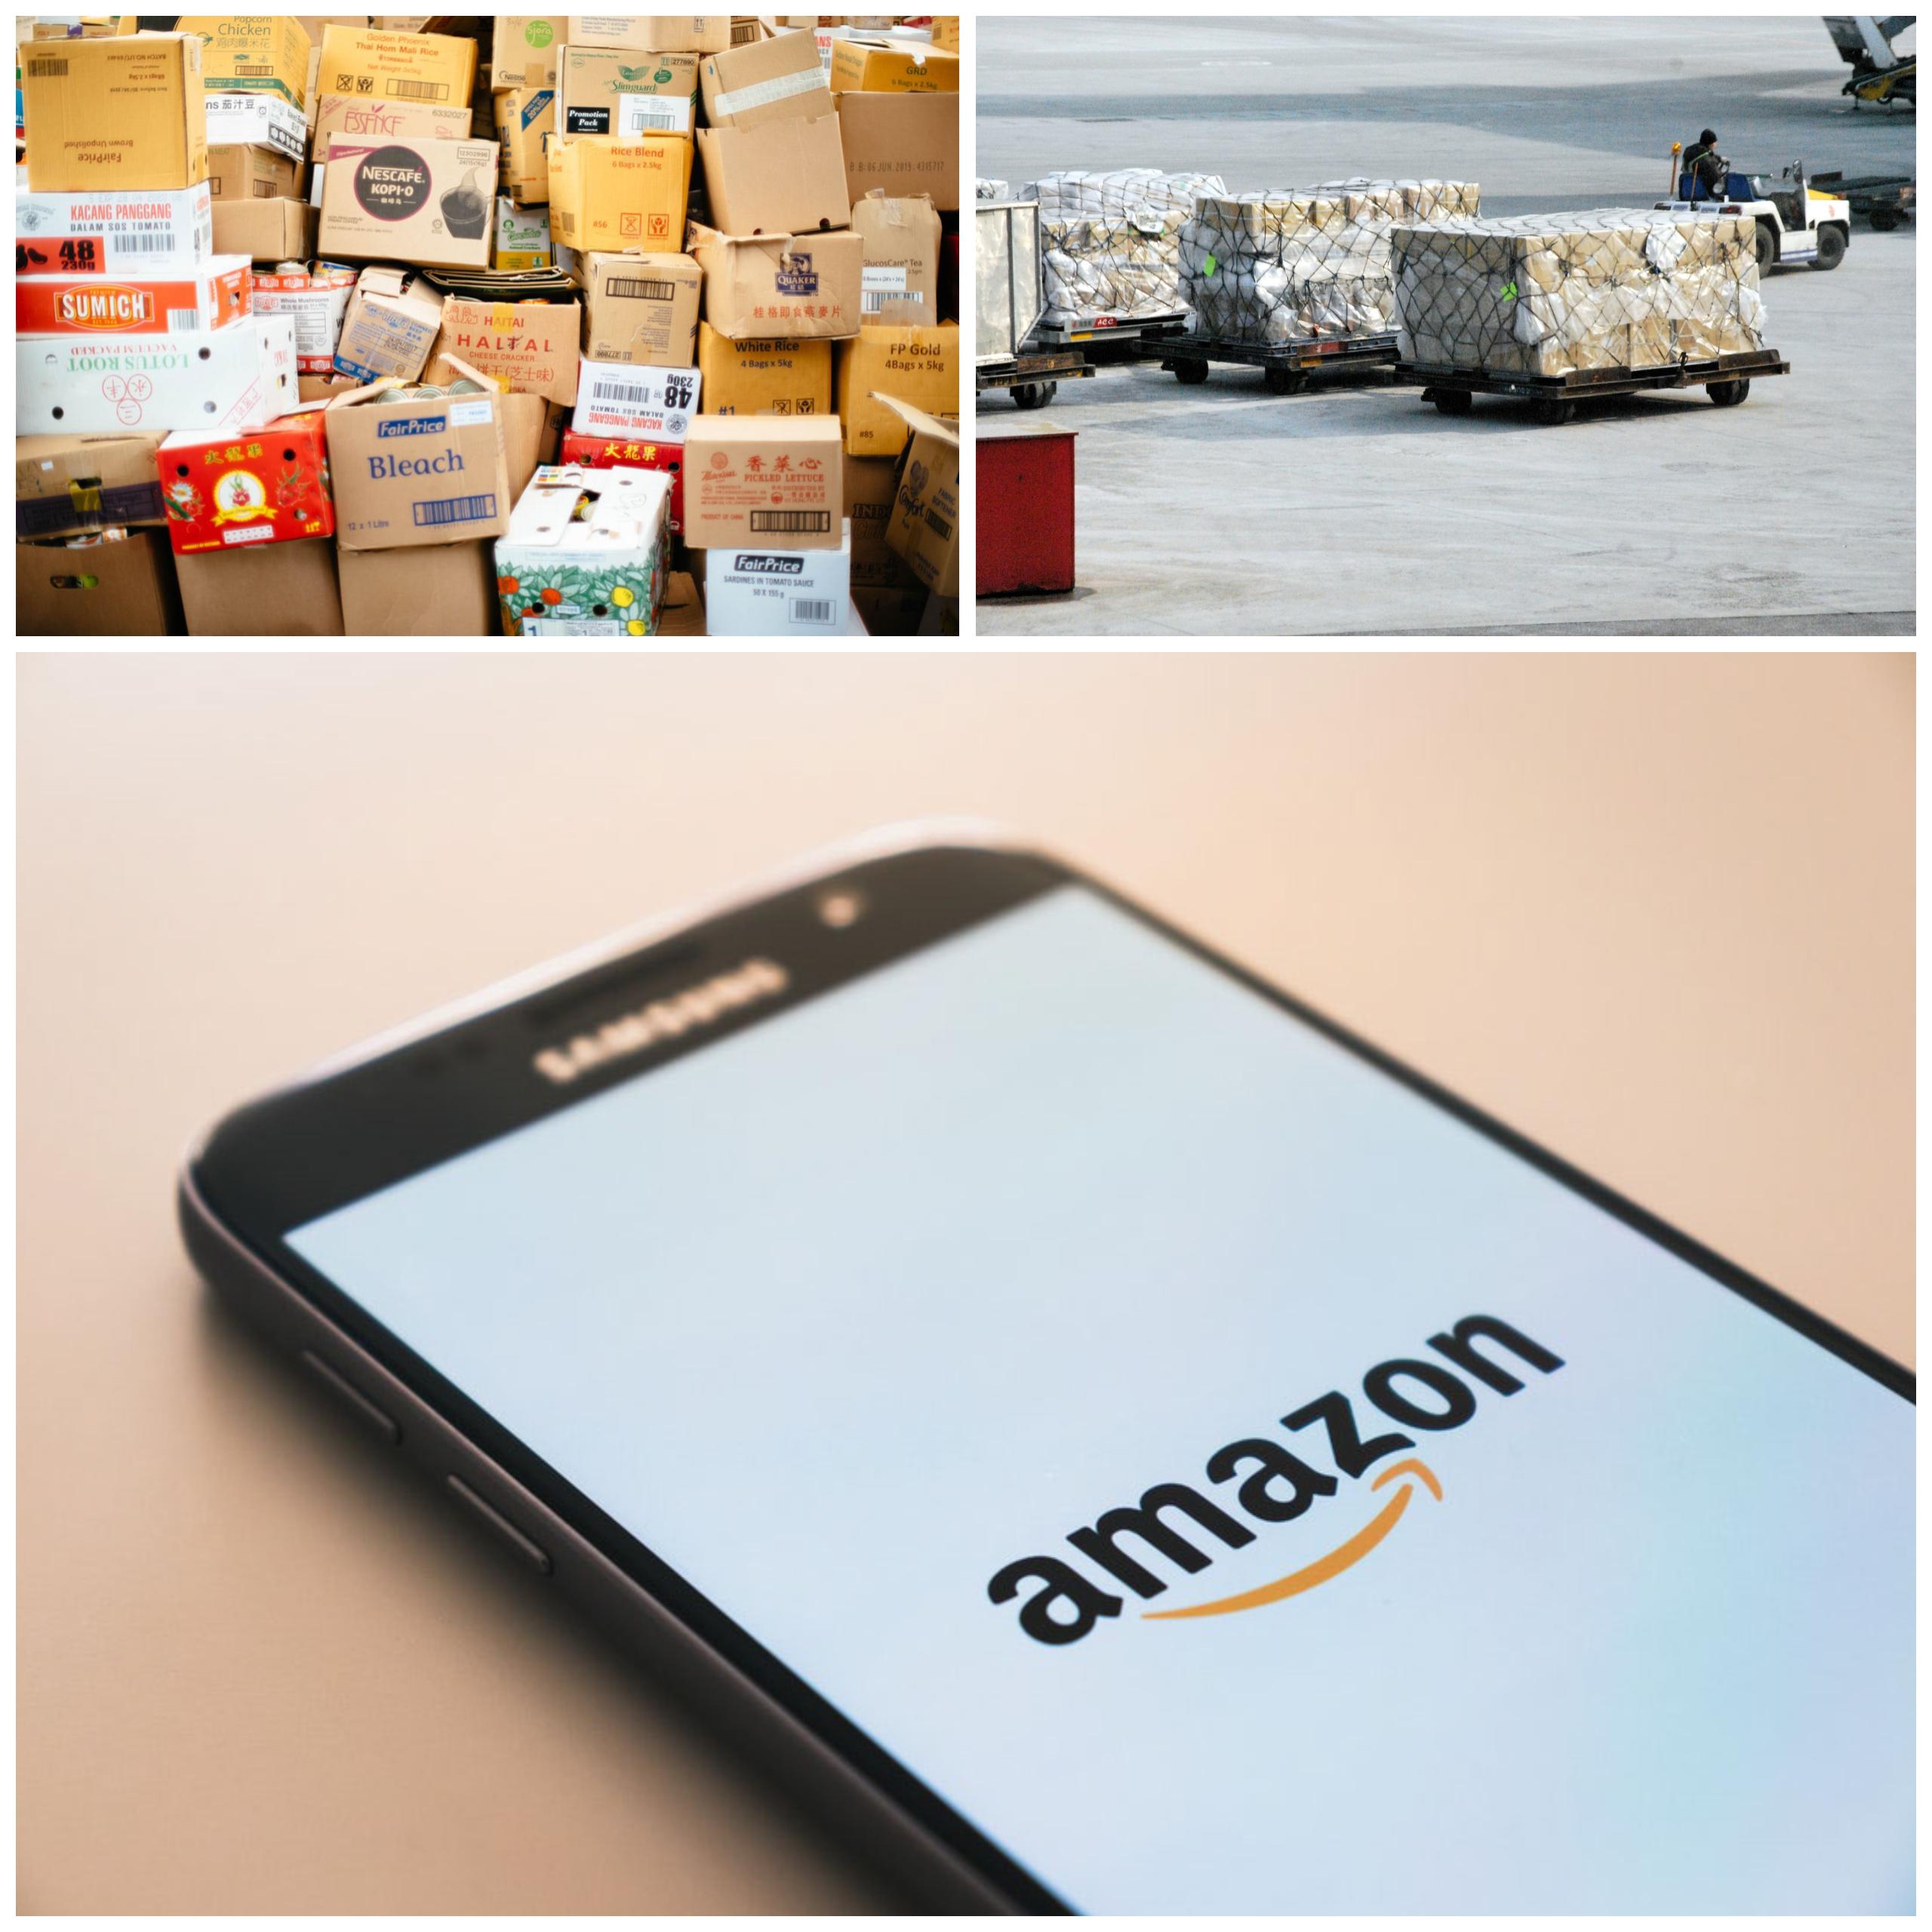 cardboard waste_Amazon_rethinkdisposabe_adobe spark image.jpg